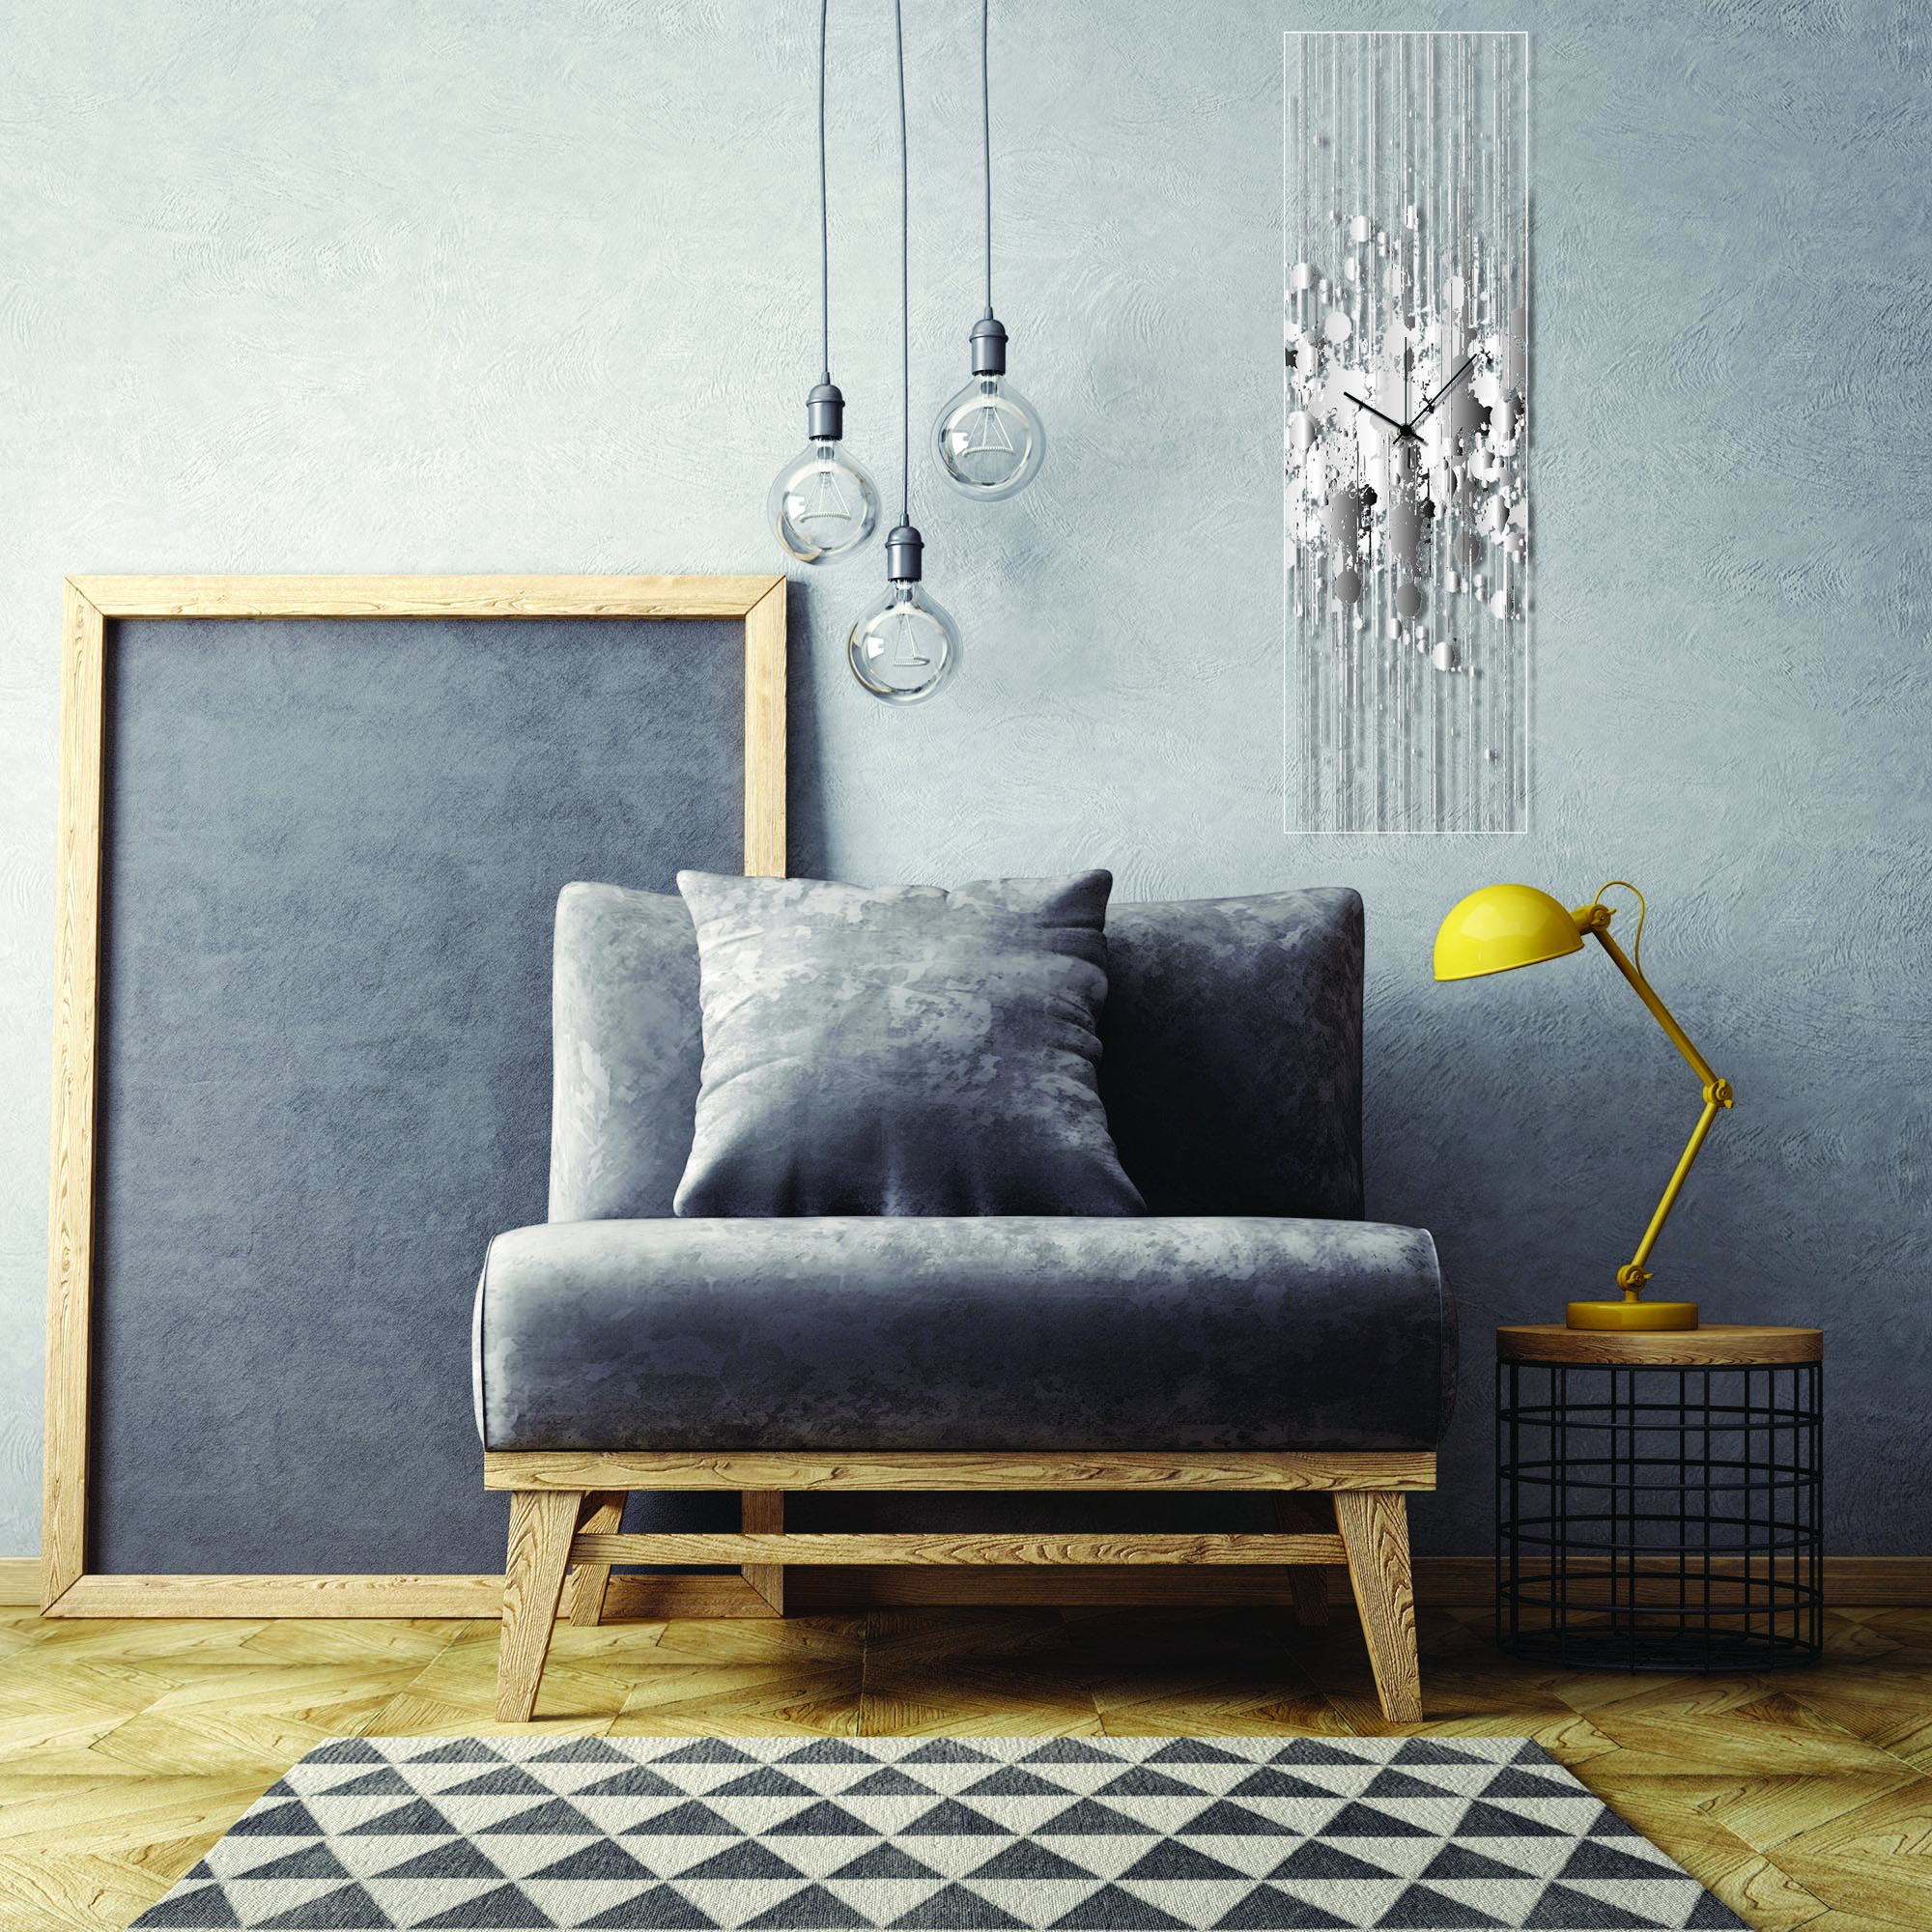 Black and White Paint Splatter Clock by Adam Schwoeppe Contemporary Decor on Plexiglass - Lifestyle View